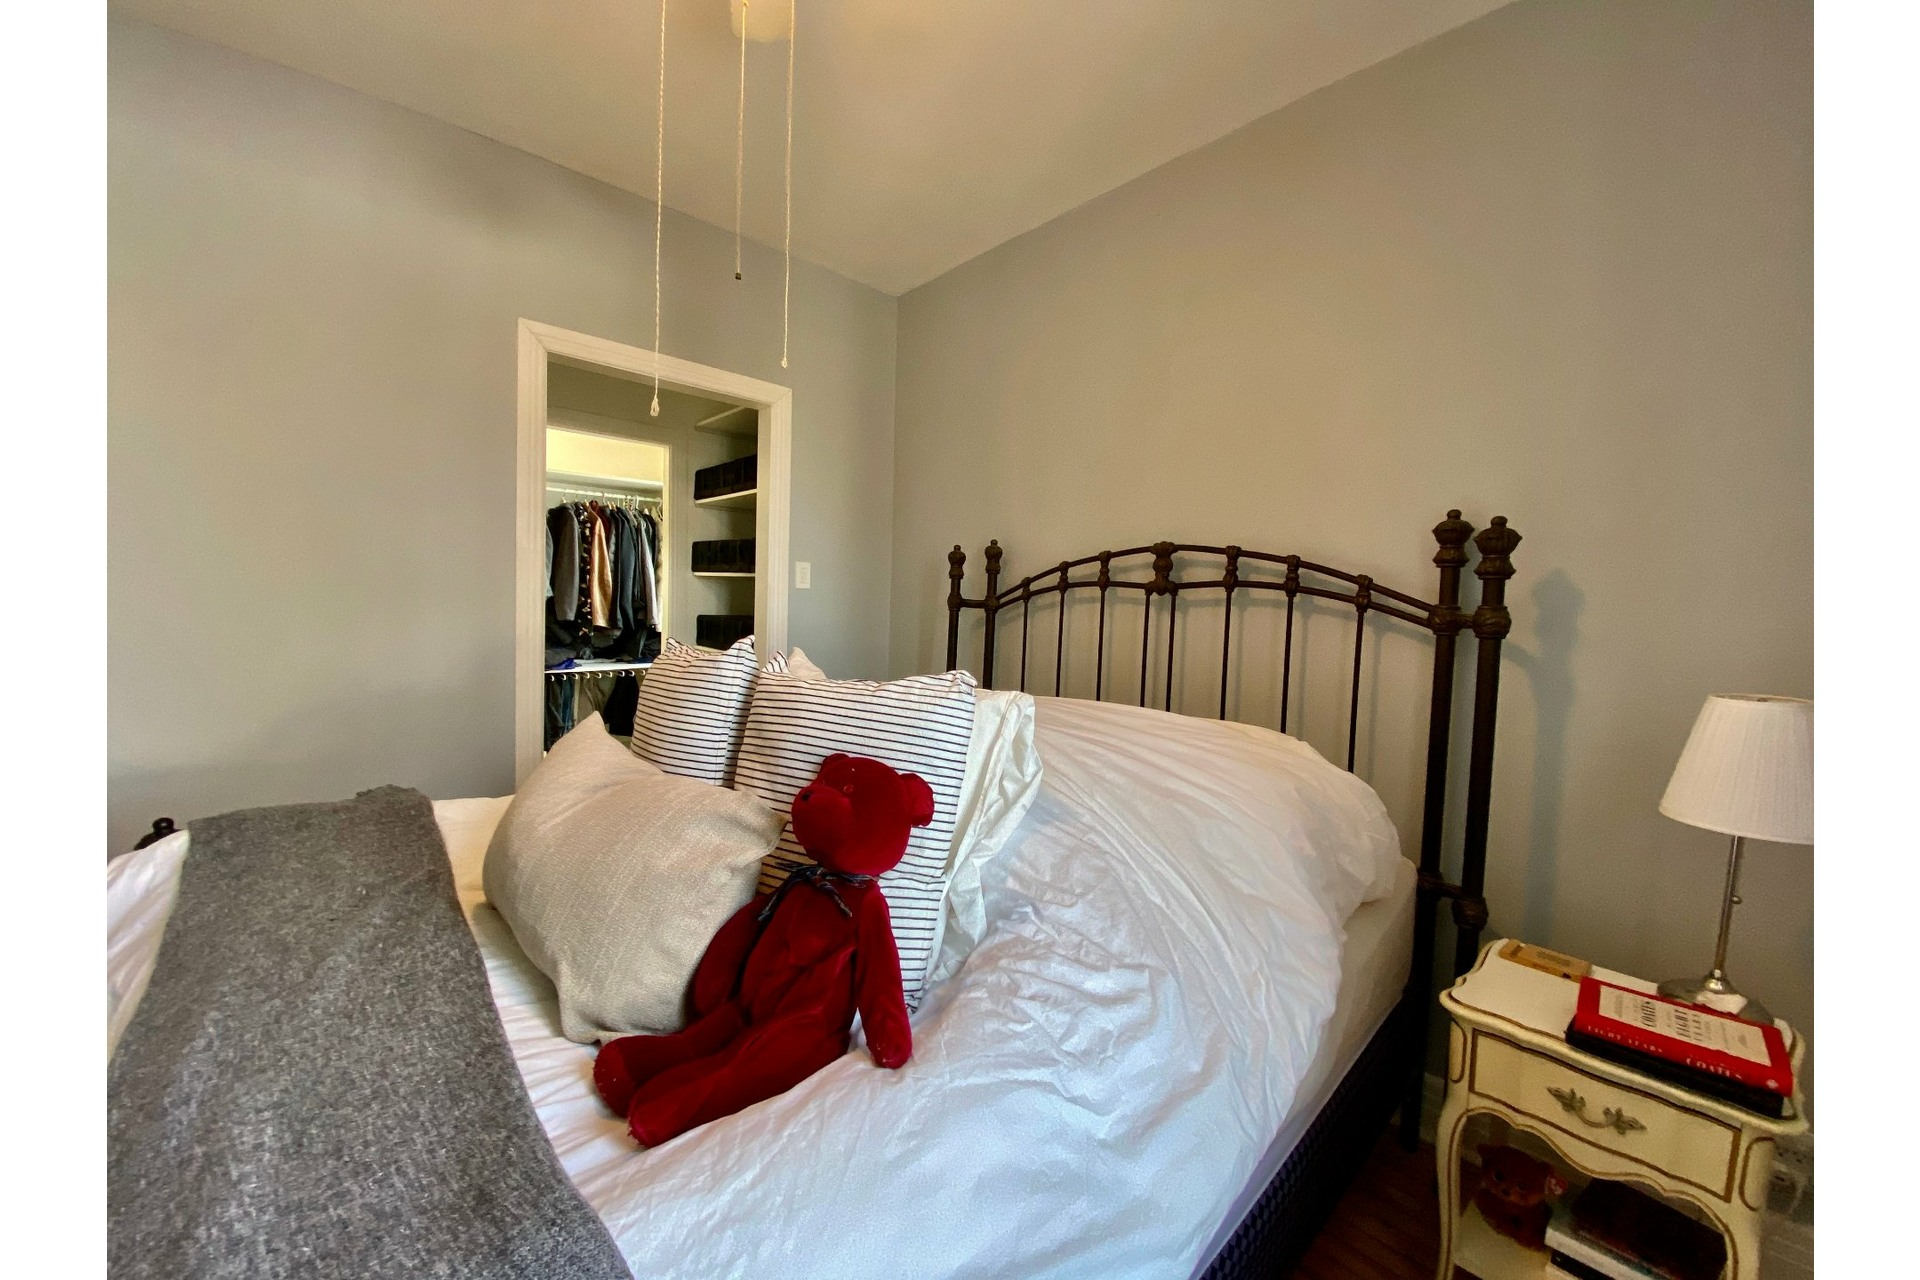 image 11 - Duplex En venta Lachine Montréal  - 6 habitaciones